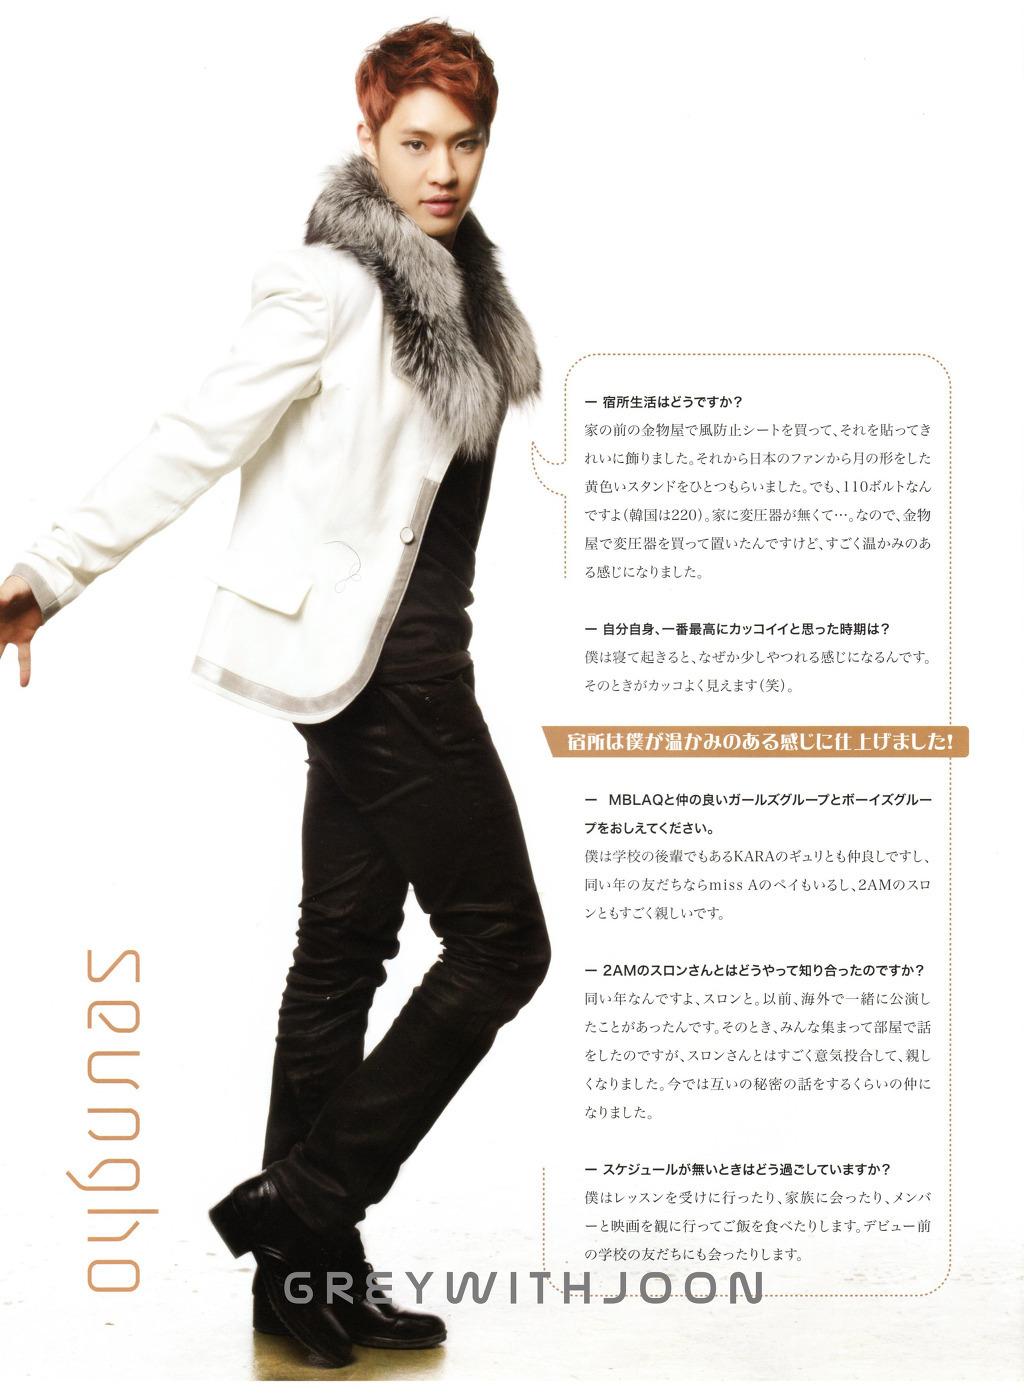 [01.03.11]MBLAQ @ CREA STAR Scan4